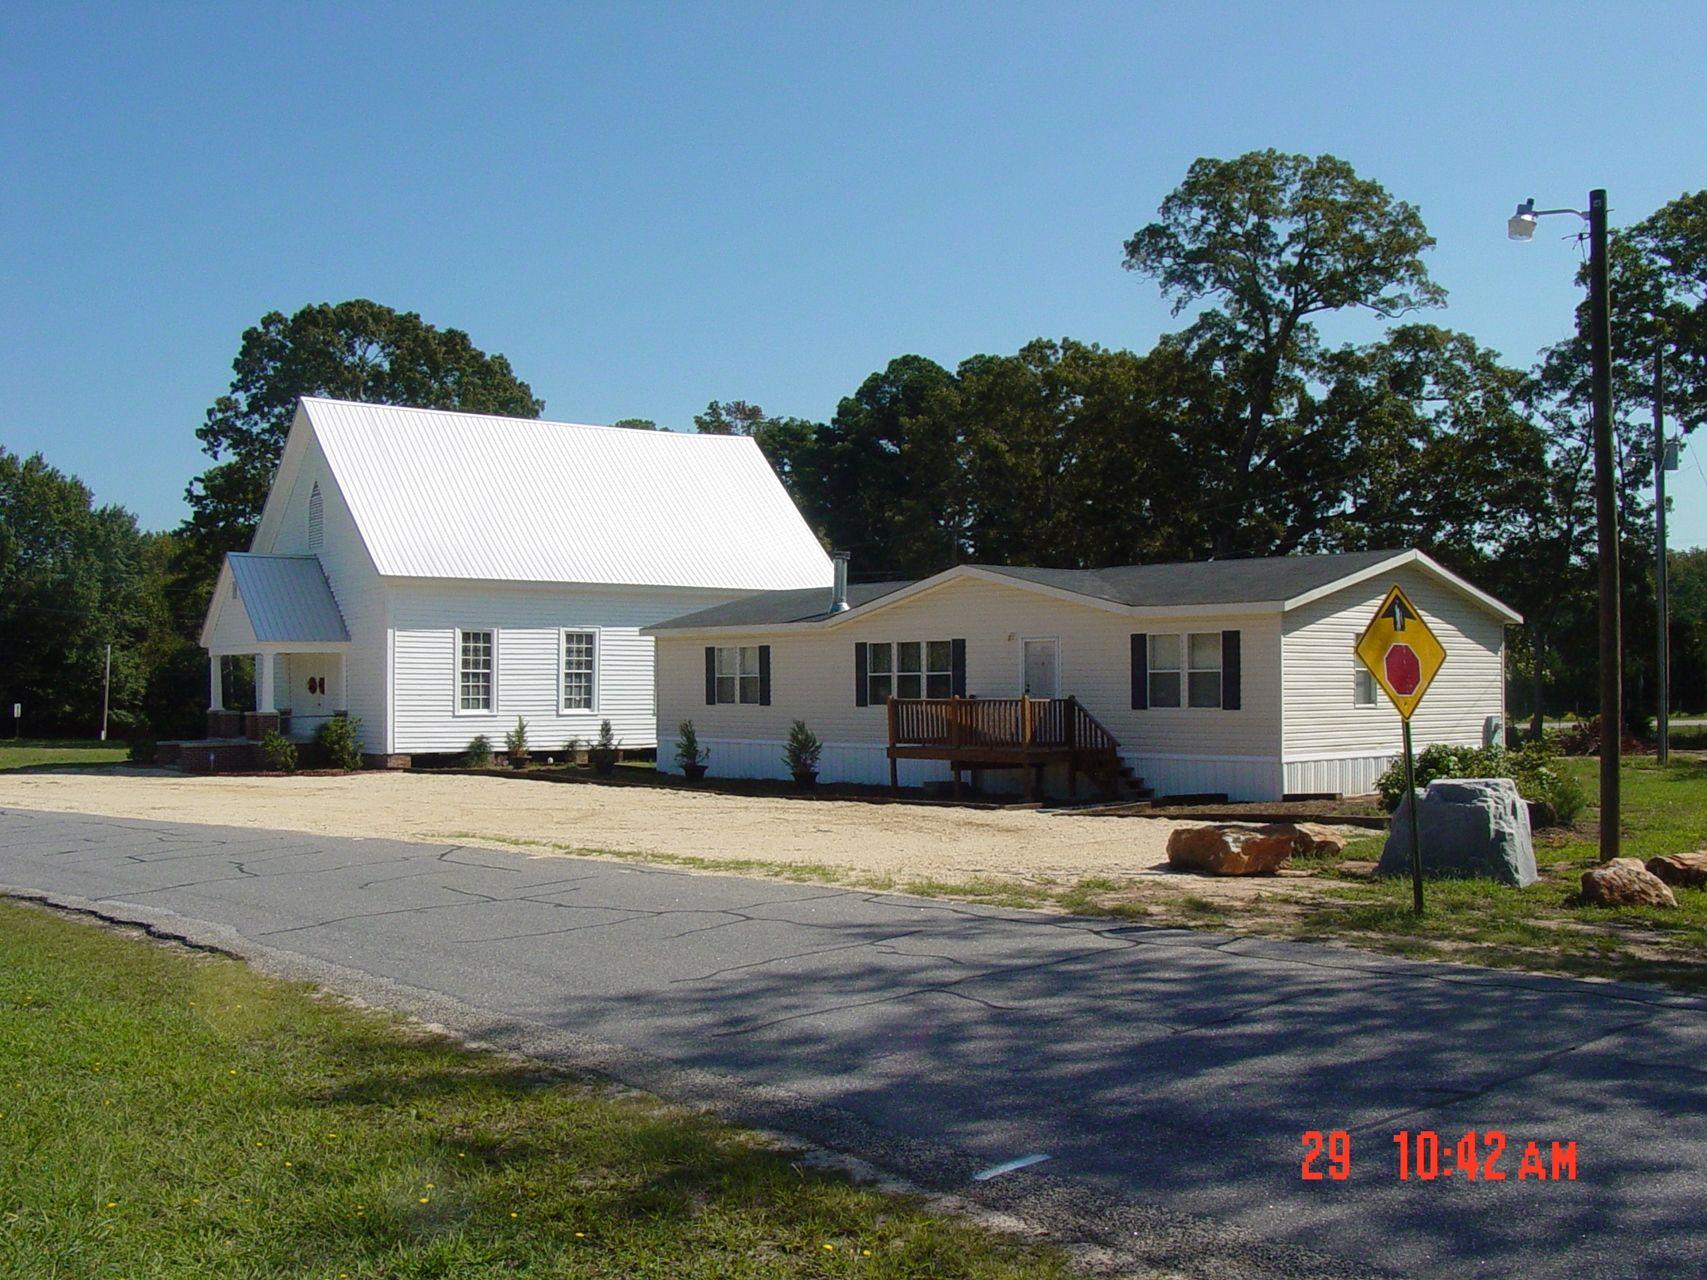 Access denied farmington property for sale outdoor